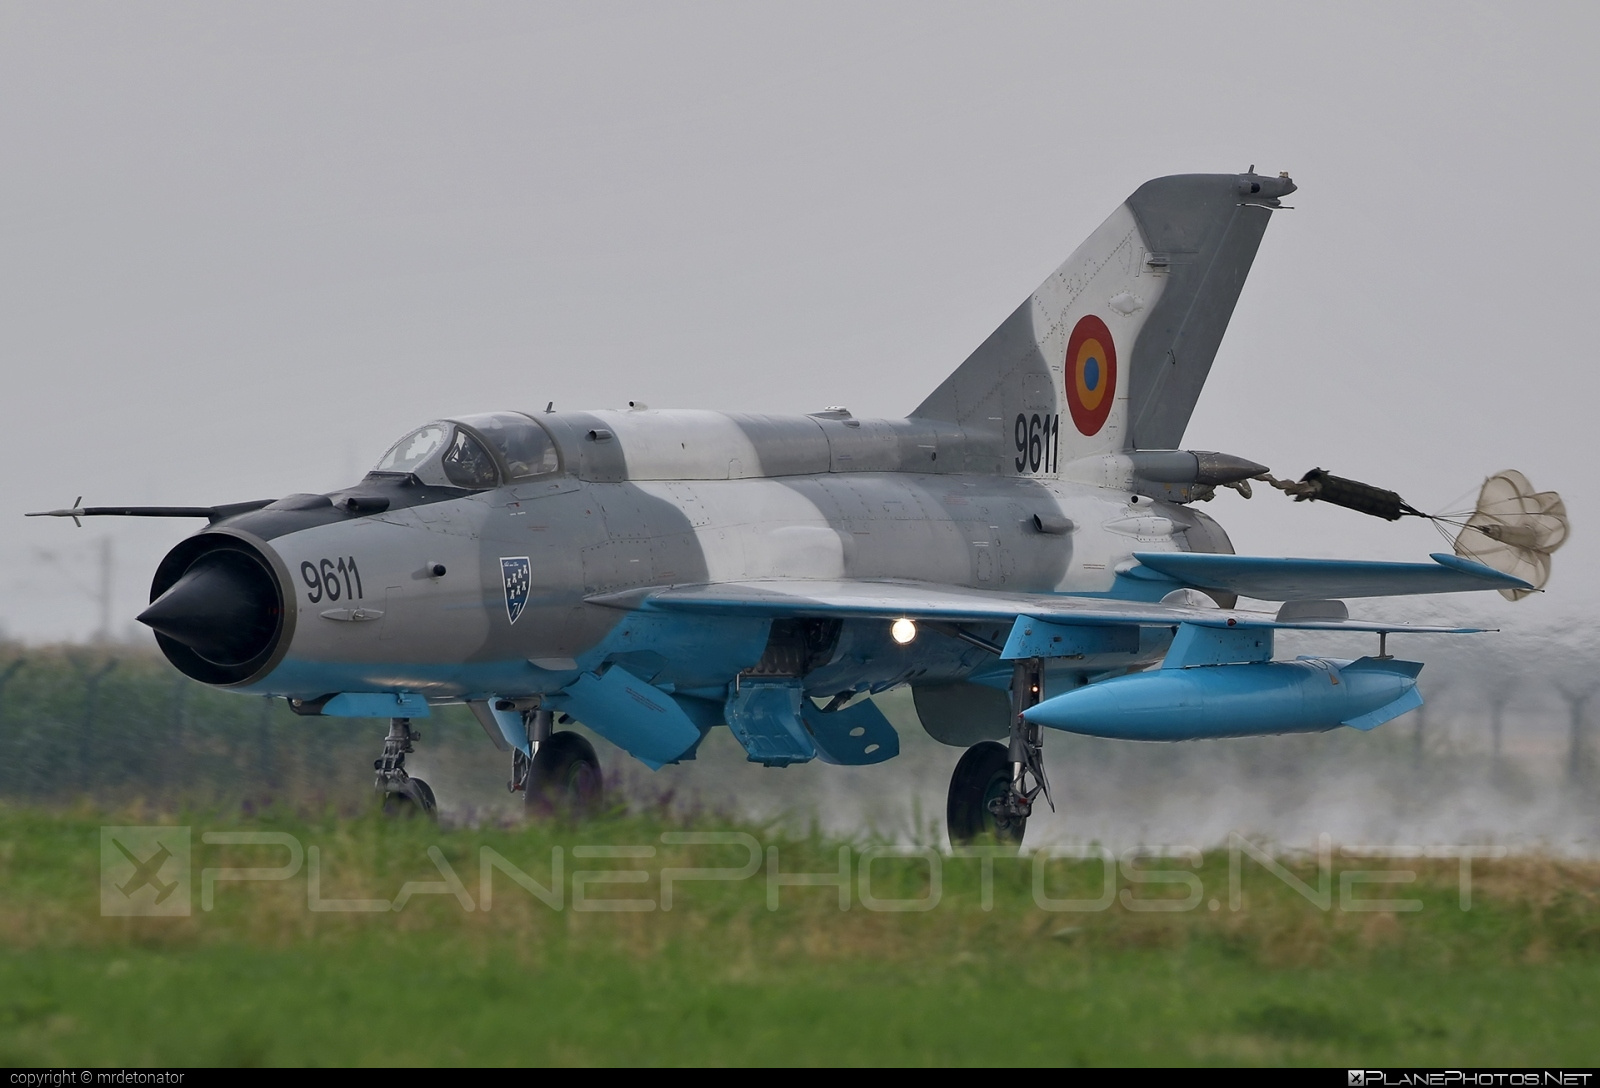 Mikoyan-Gurevich MiG-21MF - 9611 operated by Forţele Aeriene Române (Romanian Air Force) #forteleaerieneromane #mig #mig21 #mig21mf #mikoyangurevich #romanianairforce